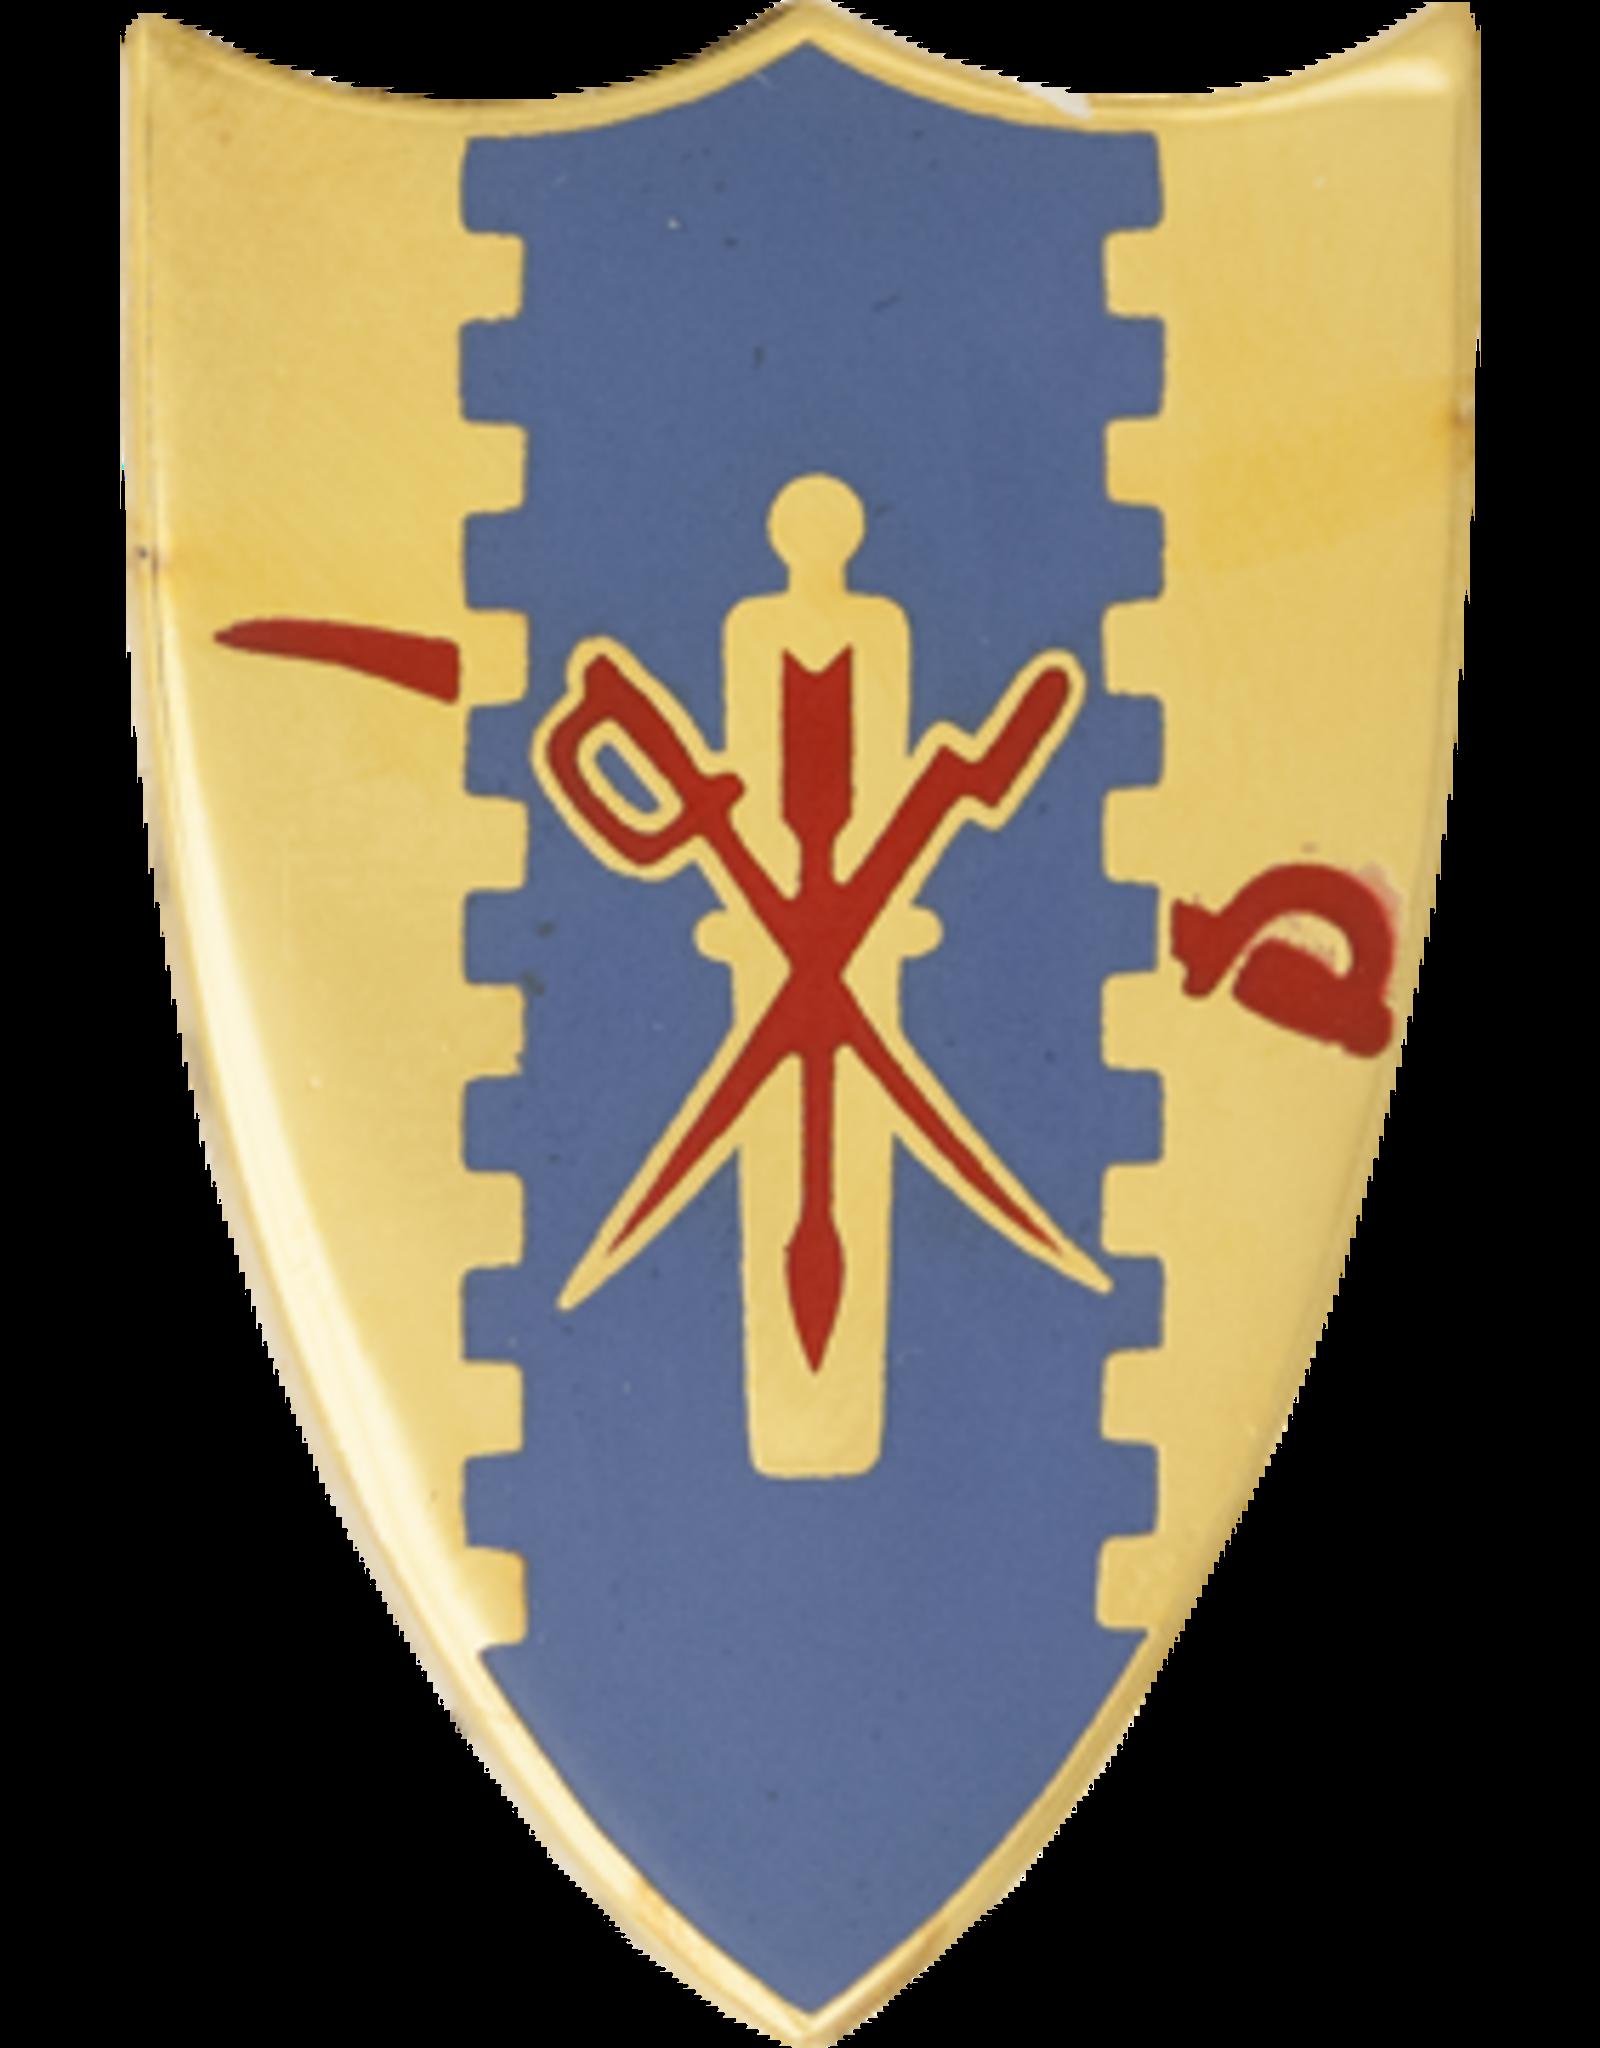 4th Cavalry Regimental Unit Crest